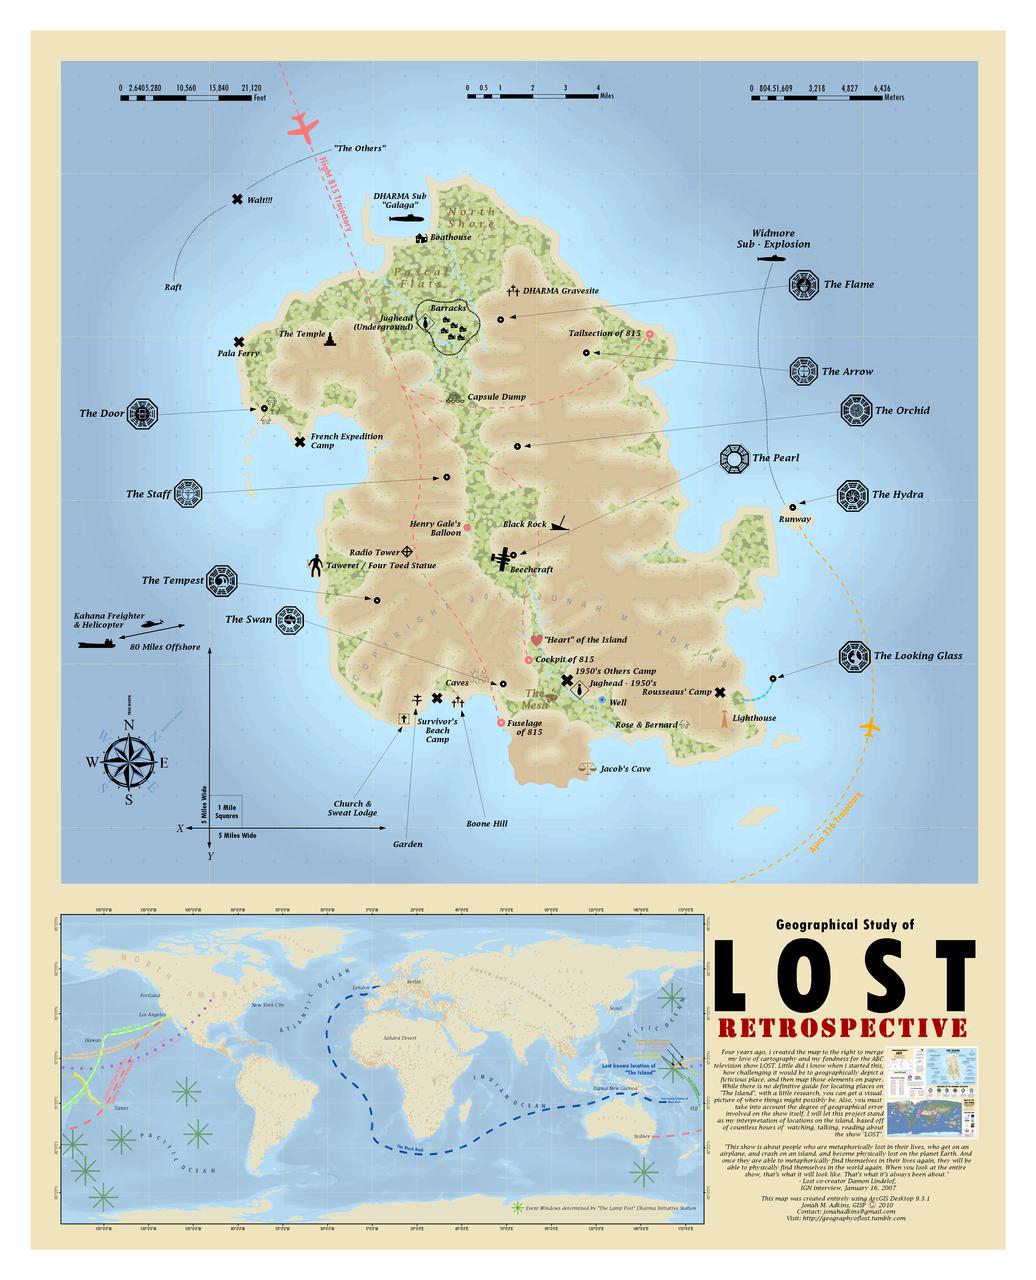 http://4.bp.blogspot.com/_Ne5Lb2SiFHg/TBfBVH9qXOI/AAAAAAAAx94/Y9Xpt5xIxyQ/s1600/lost%2Bisland%2Bmap.png